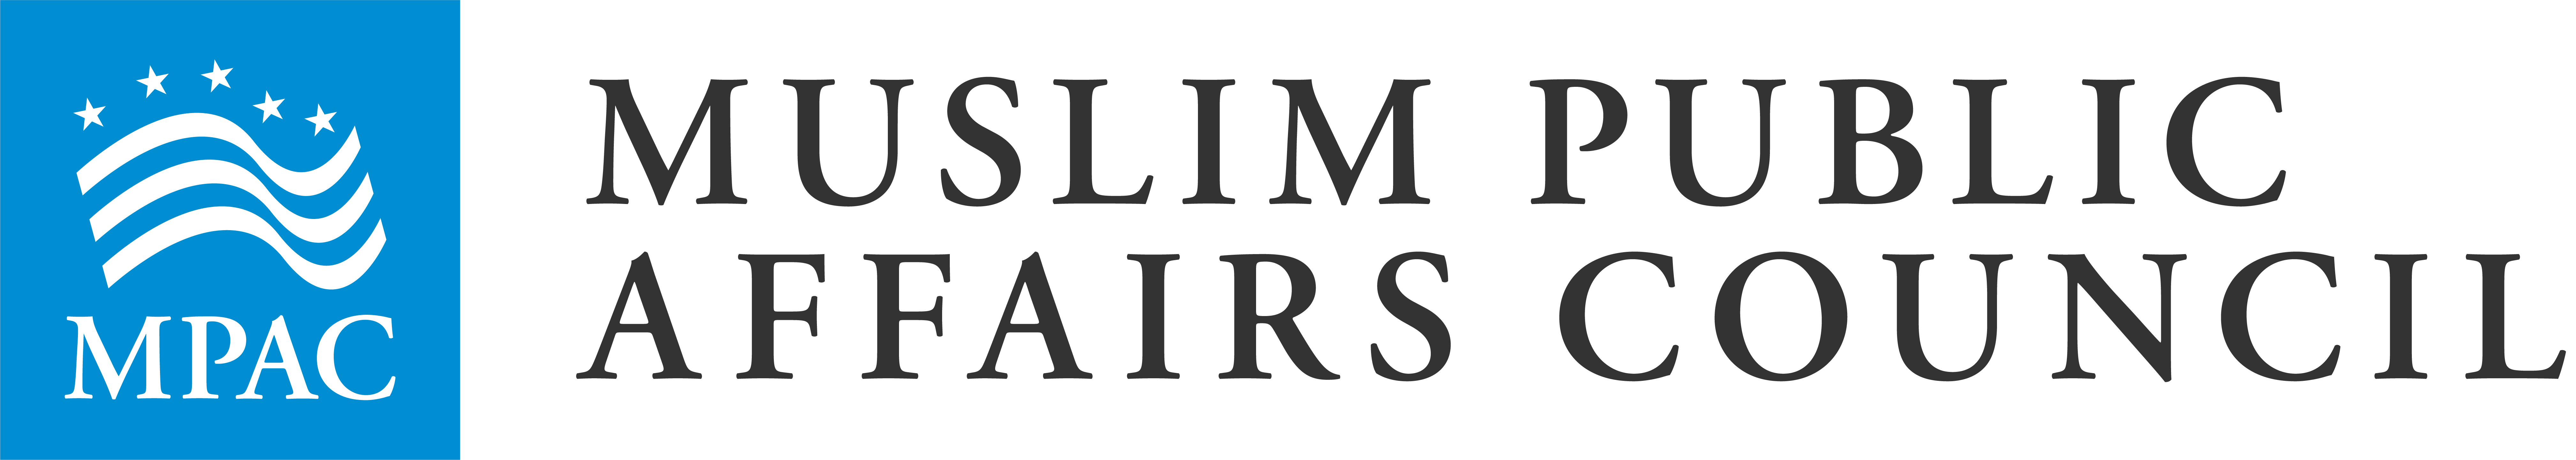 Muslim Public Affairs Council Logo